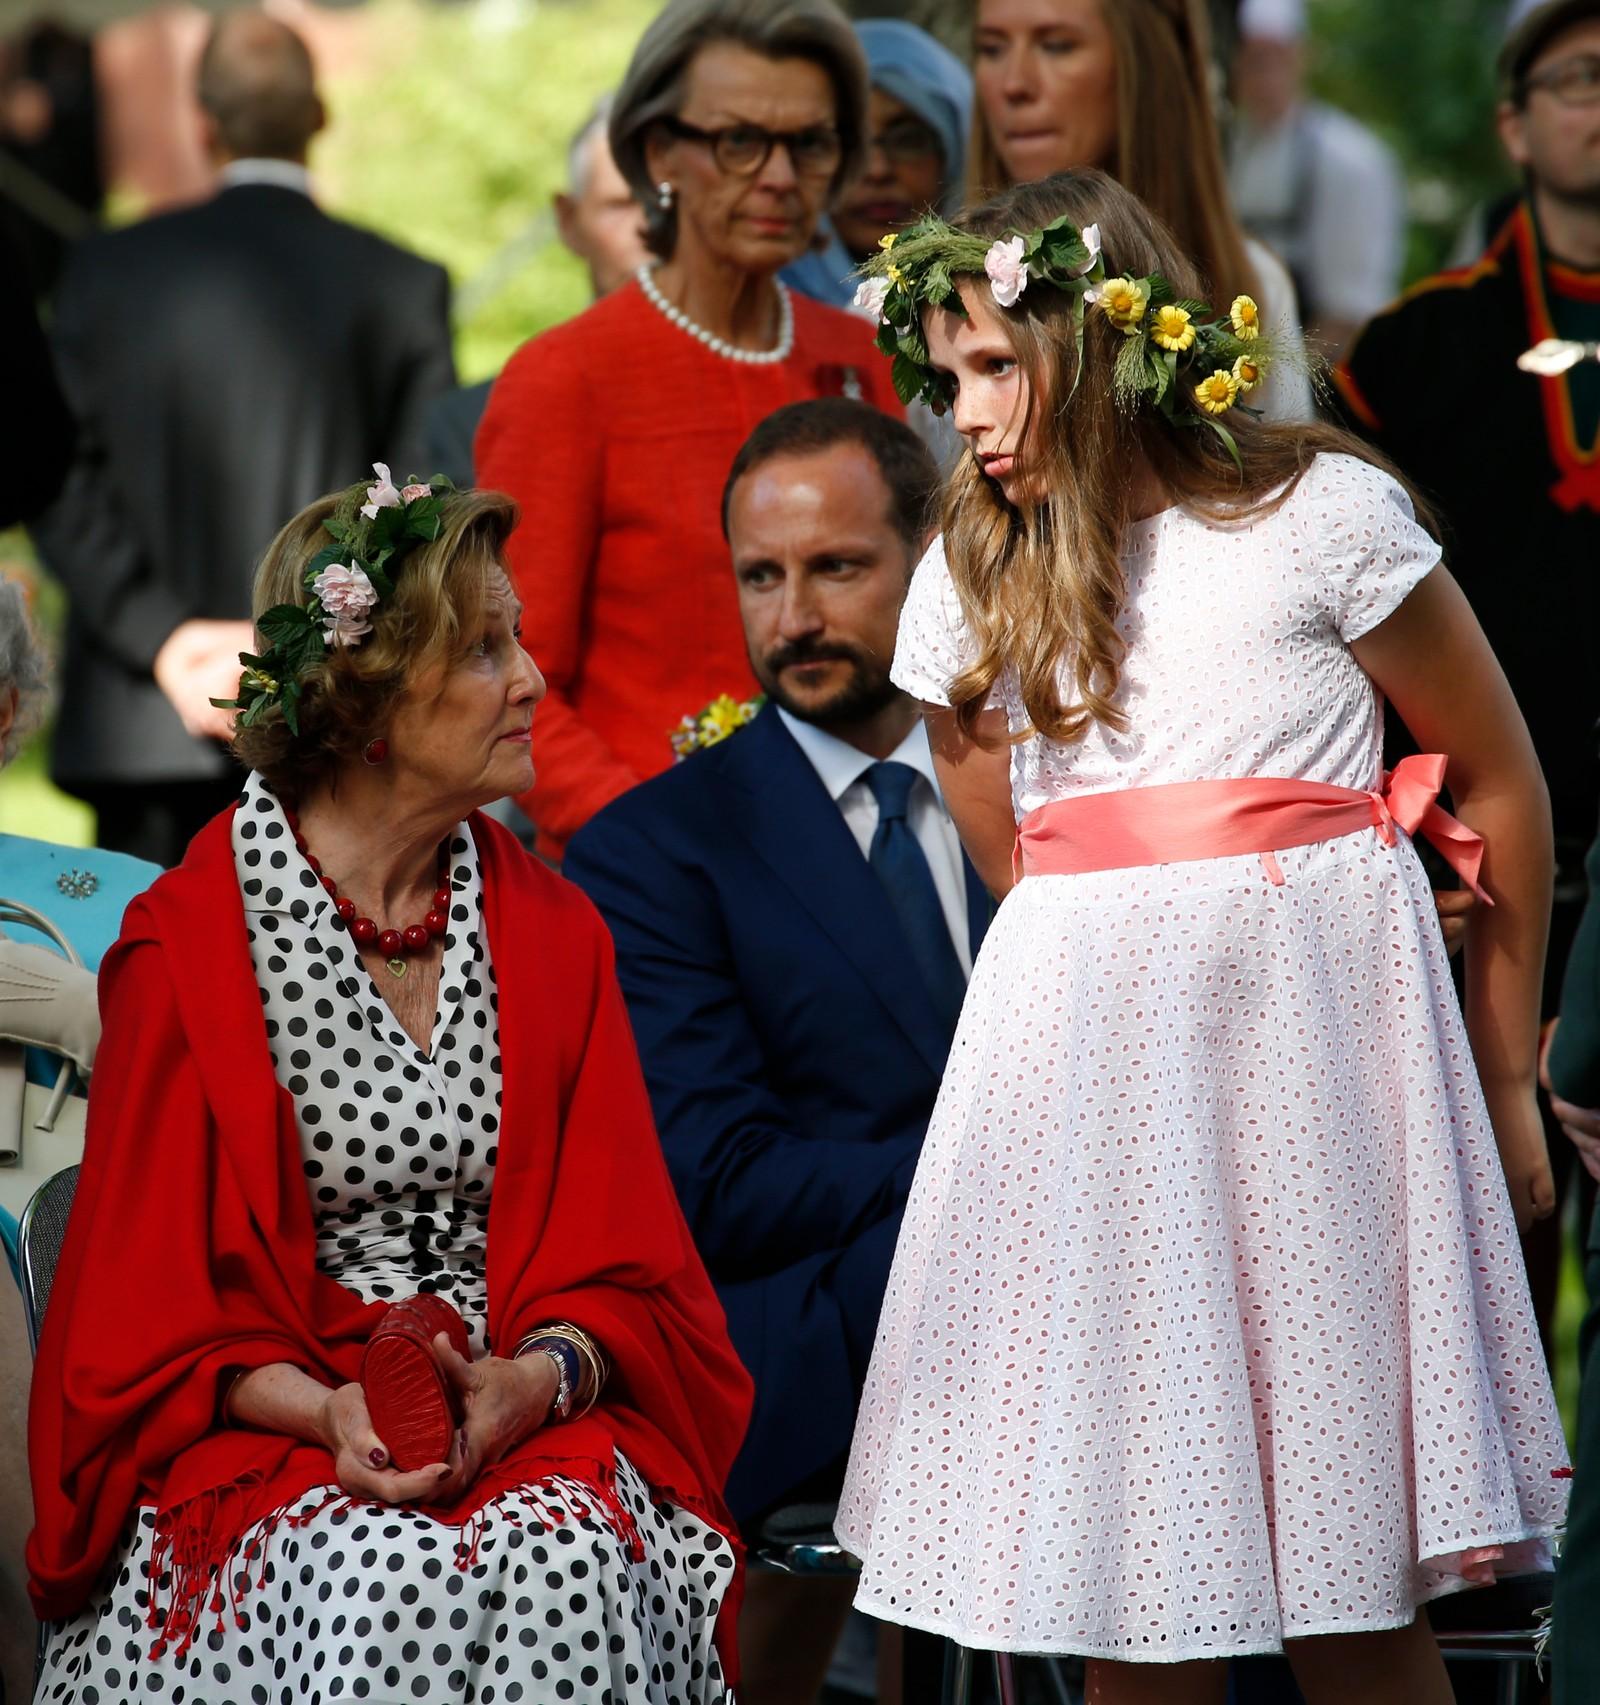 Prinsesse Ingrid Alexandra og dronning Sonja i hageselskapet i Stiftsgården i Trondheim.